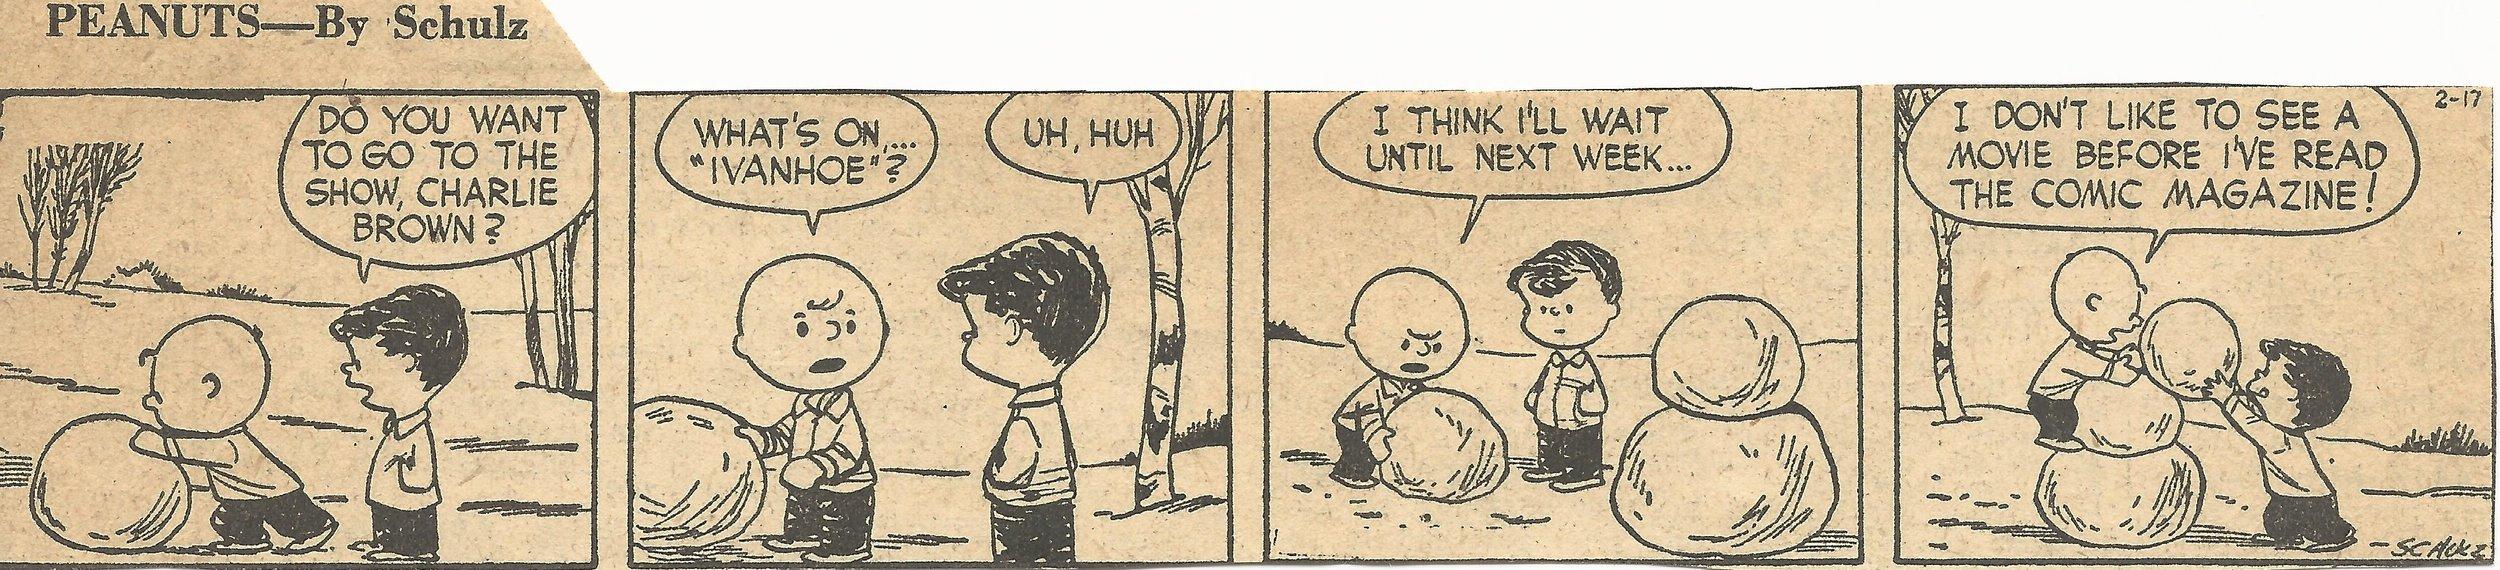 Feb. 17, 1953_Peanuts_2.jpg